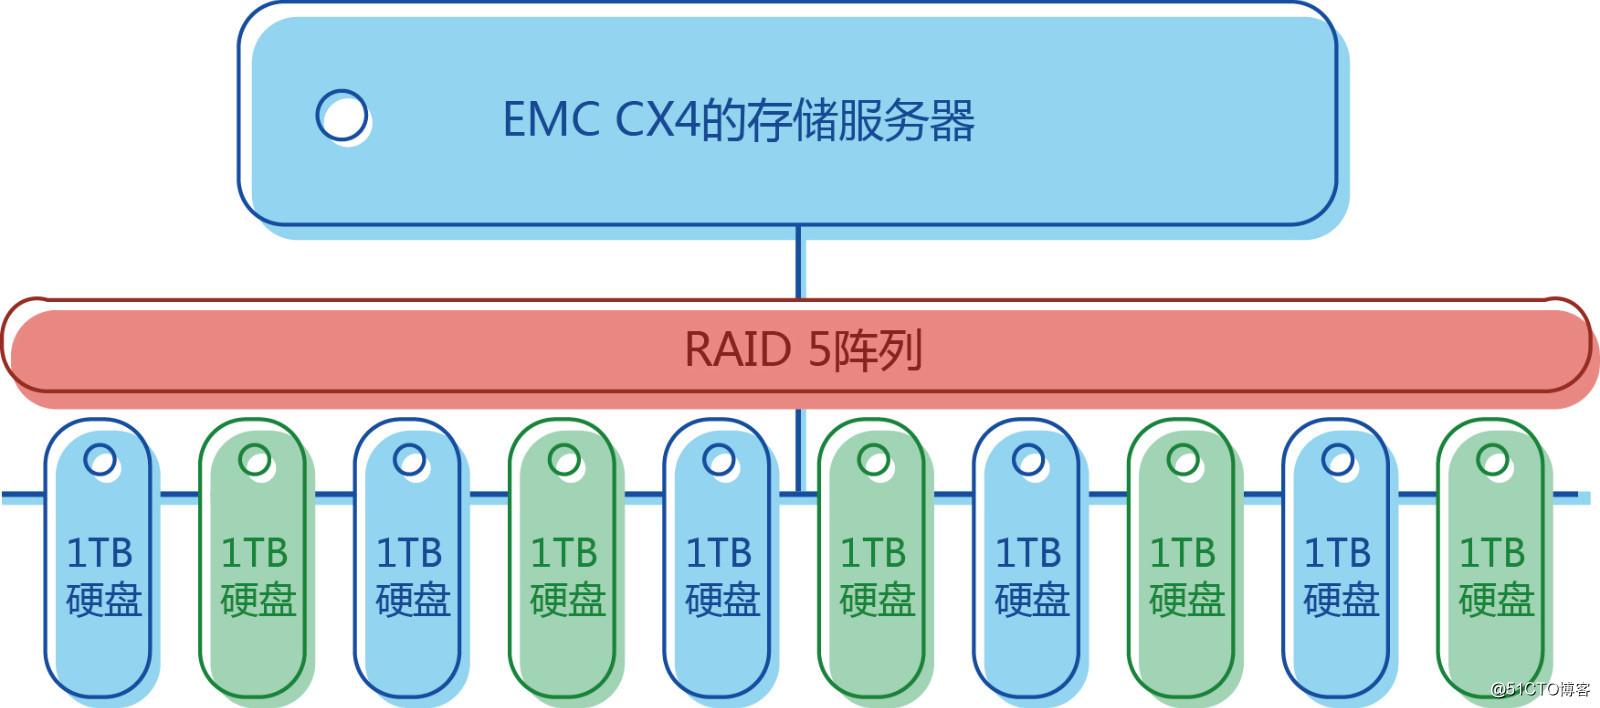 EMC CX4-480服务器恢复数据方法